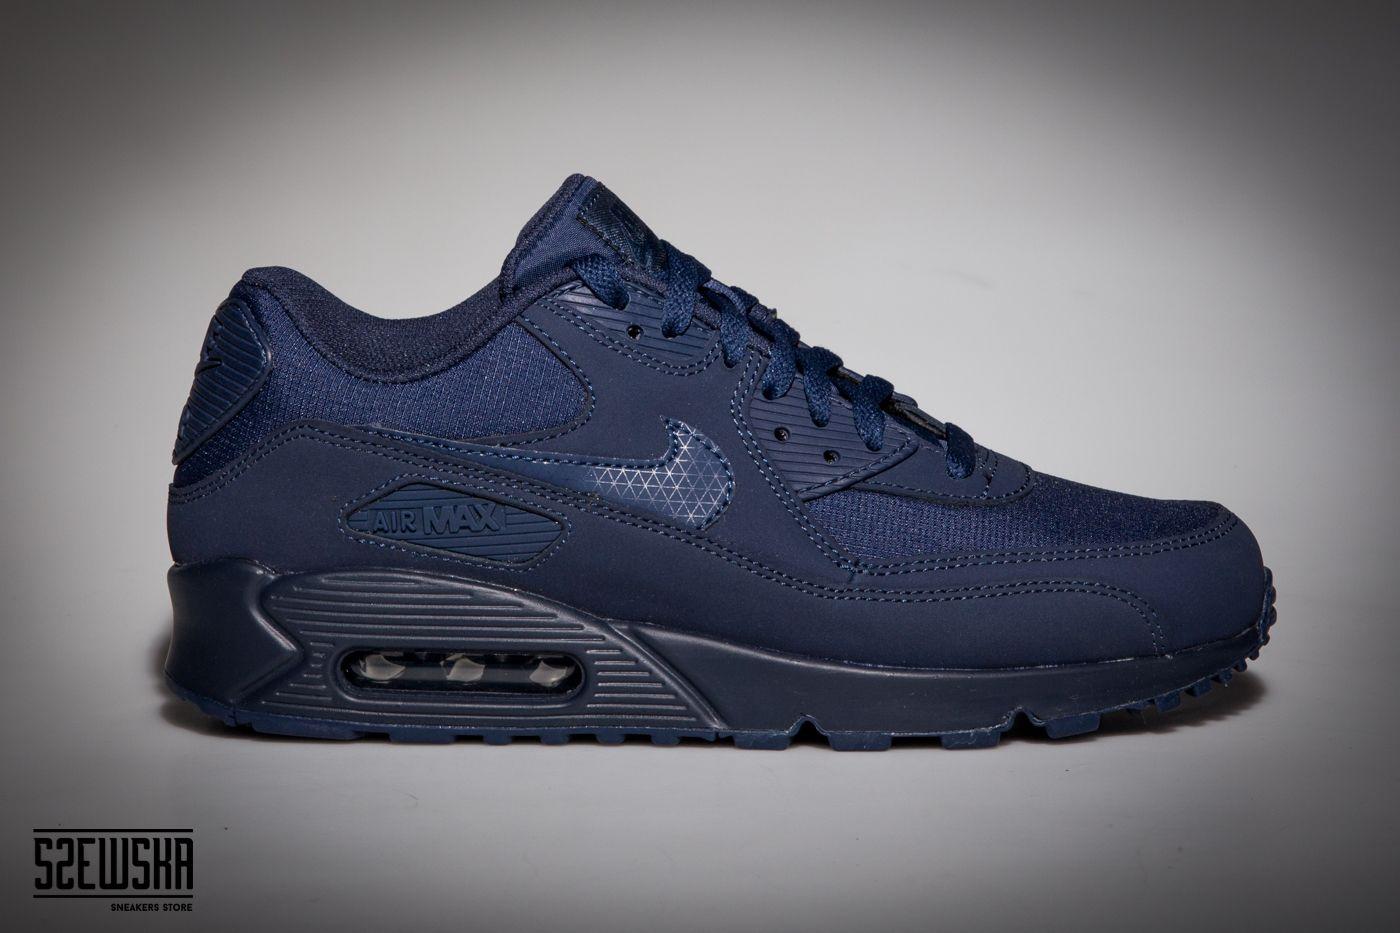 Nike Air Max 90 | 537384 412 | Szewska Sneakers Store | e